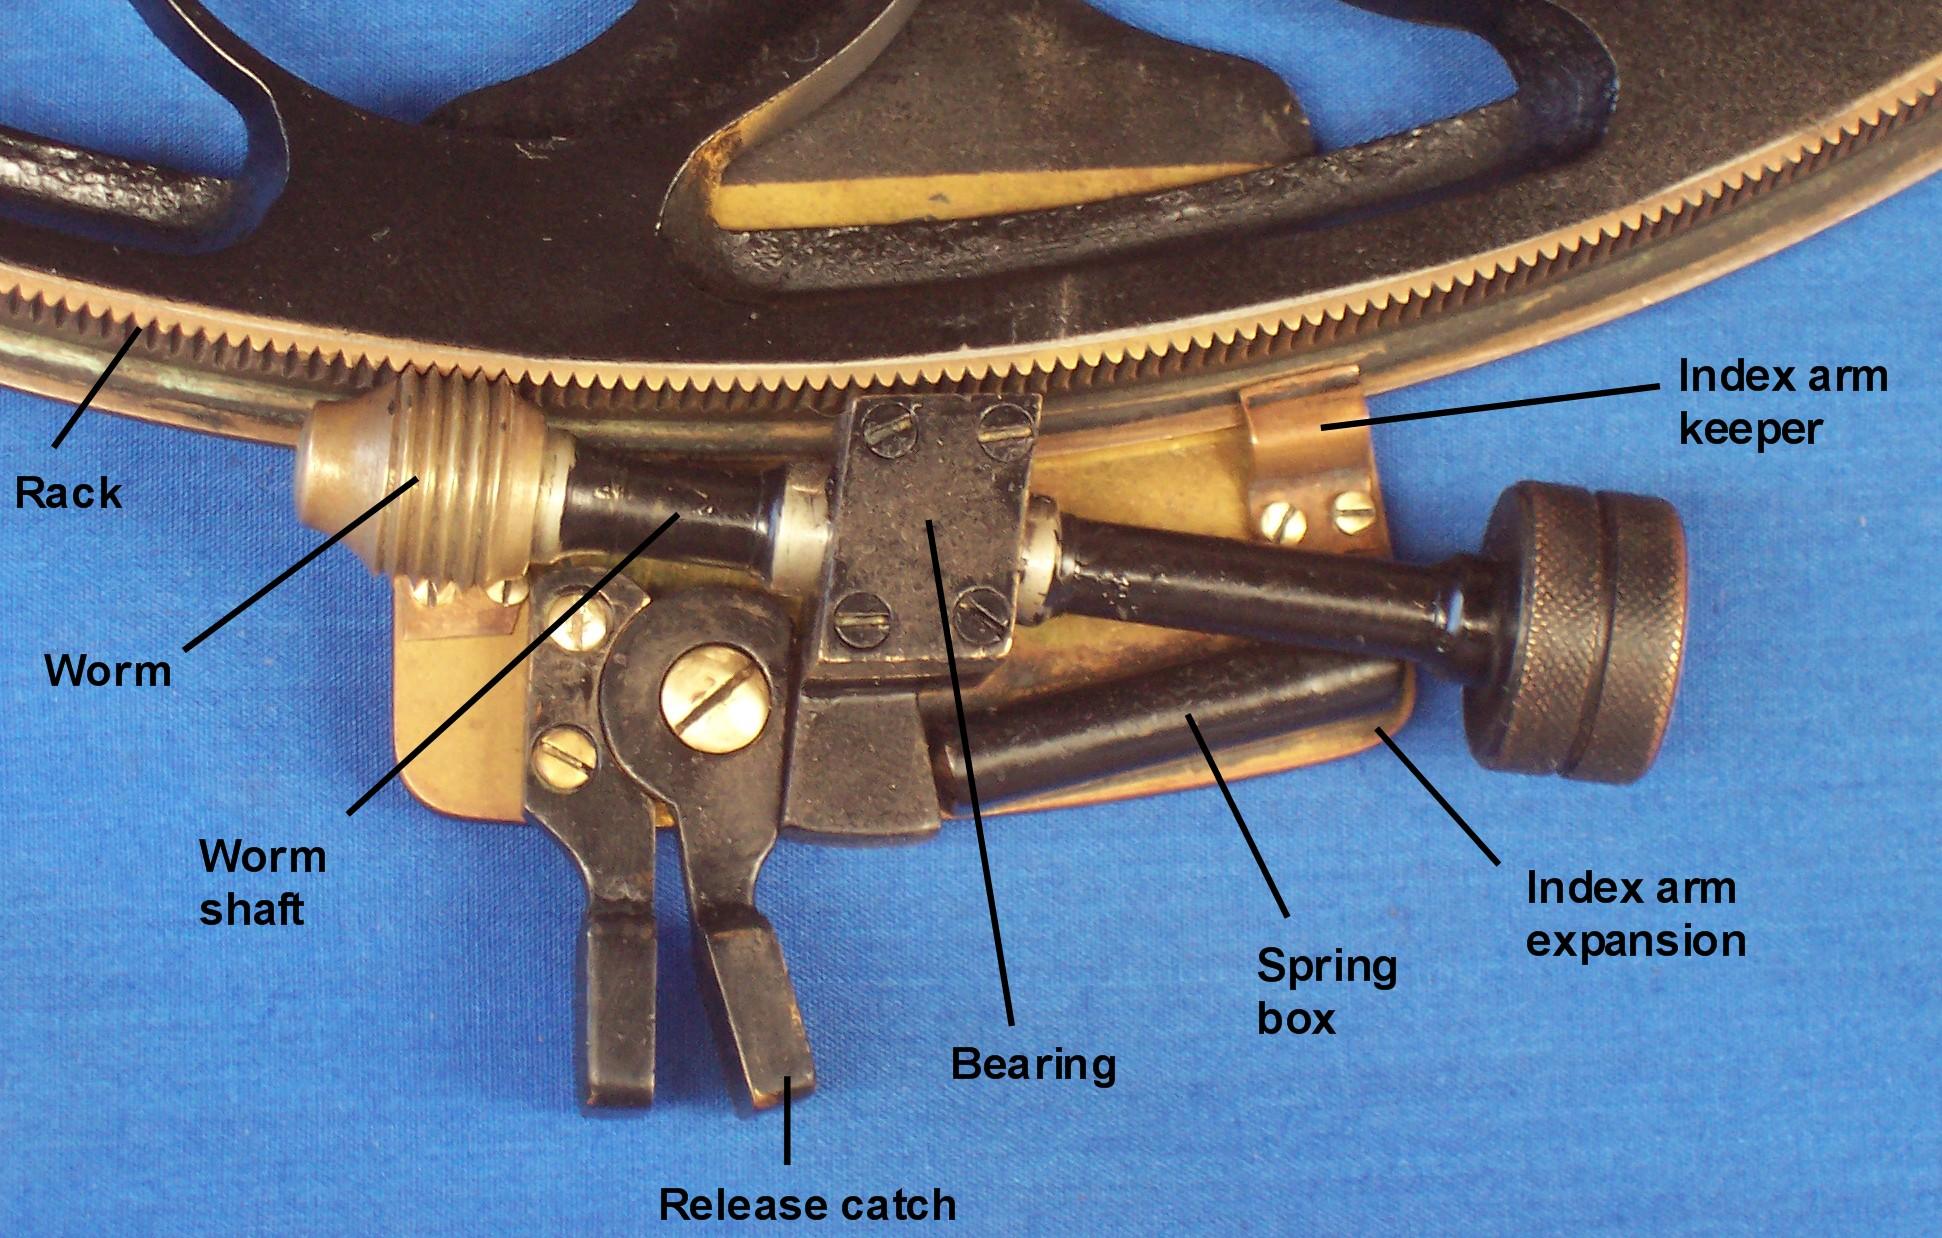 Micrometer, rear view